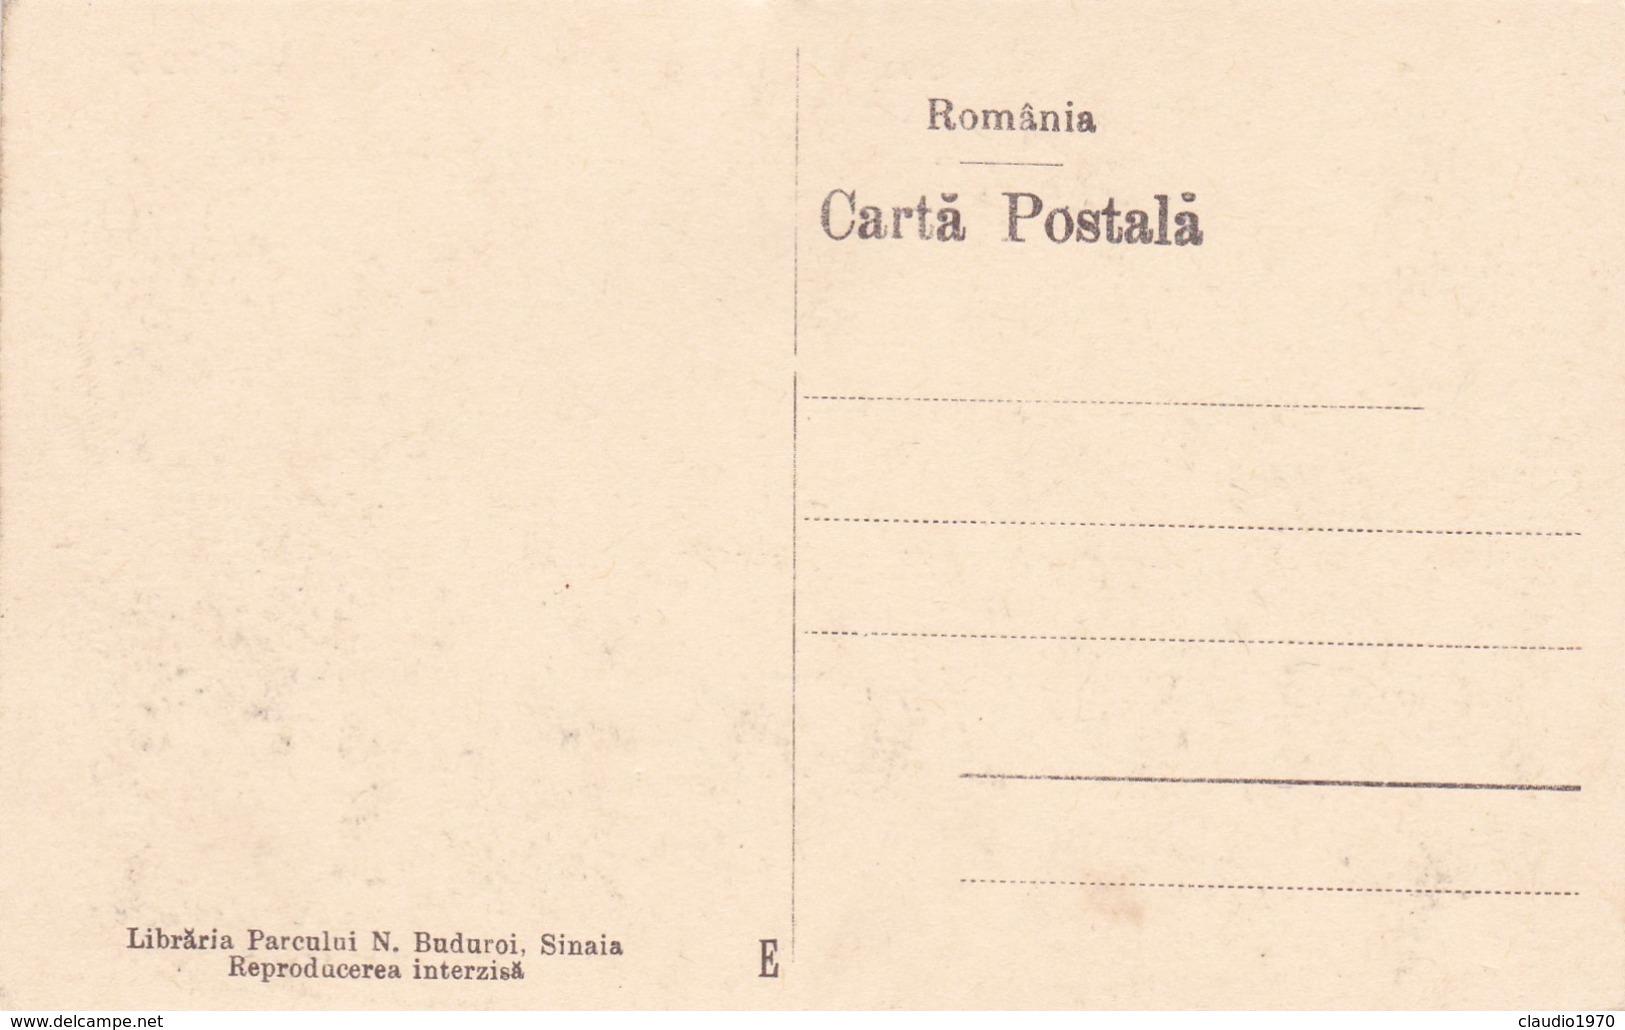 CARTOLINA - POSTCARD - ROMANIA - BIUROURILE COSTINESCU - Romania